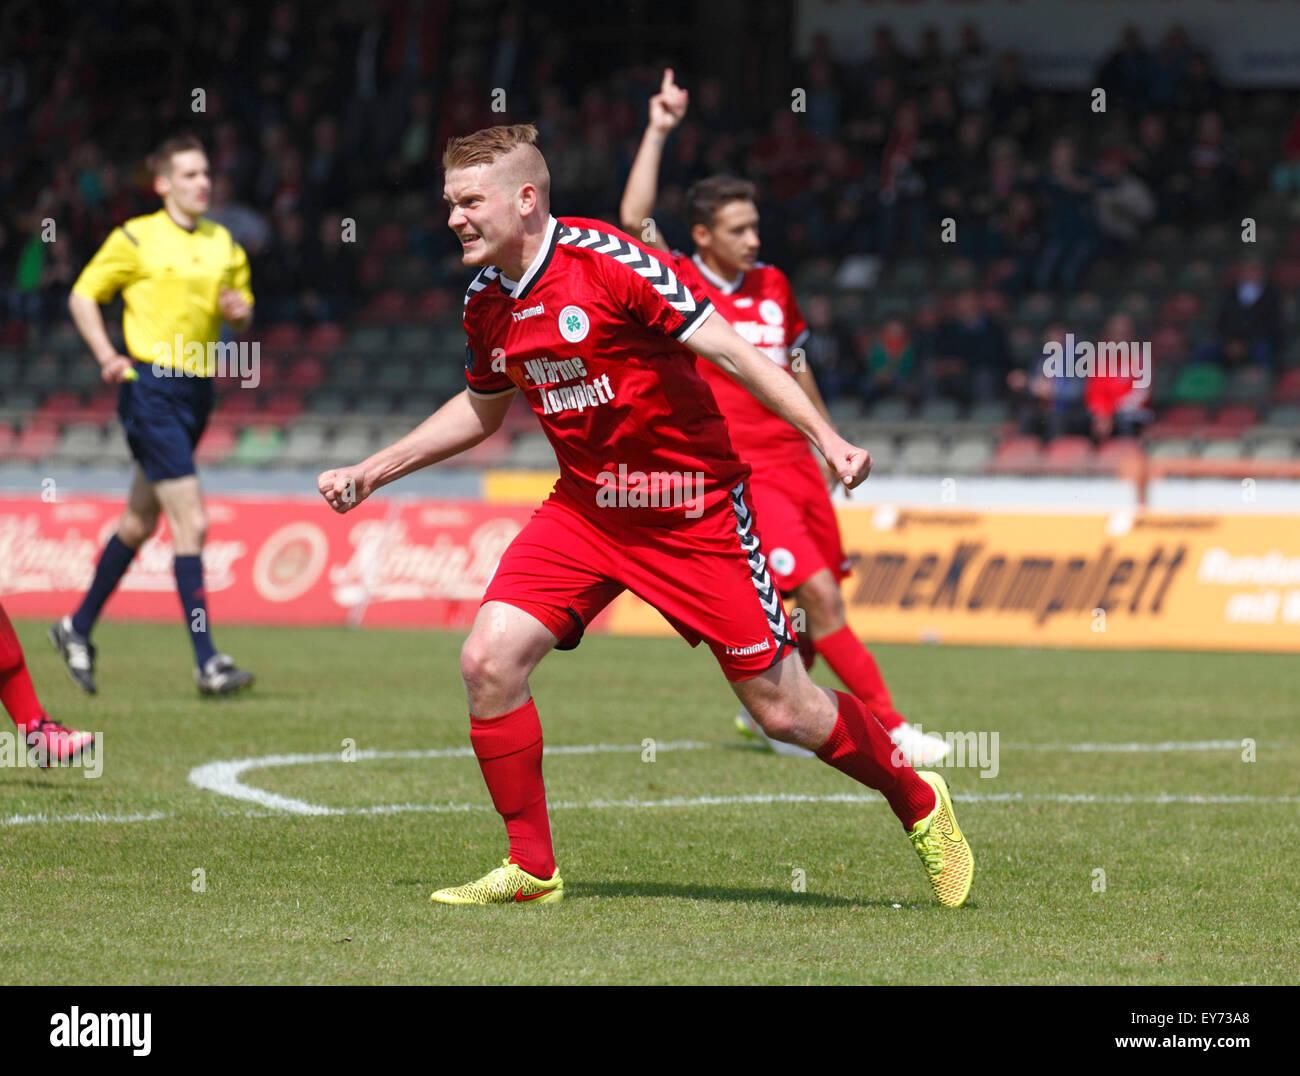 sports, football, Regional League West, 2014/2015, Rot Weiss Oberhausen versus FC Viktoria Koeln 3:2, Stadium Niederrhein Stock Photo